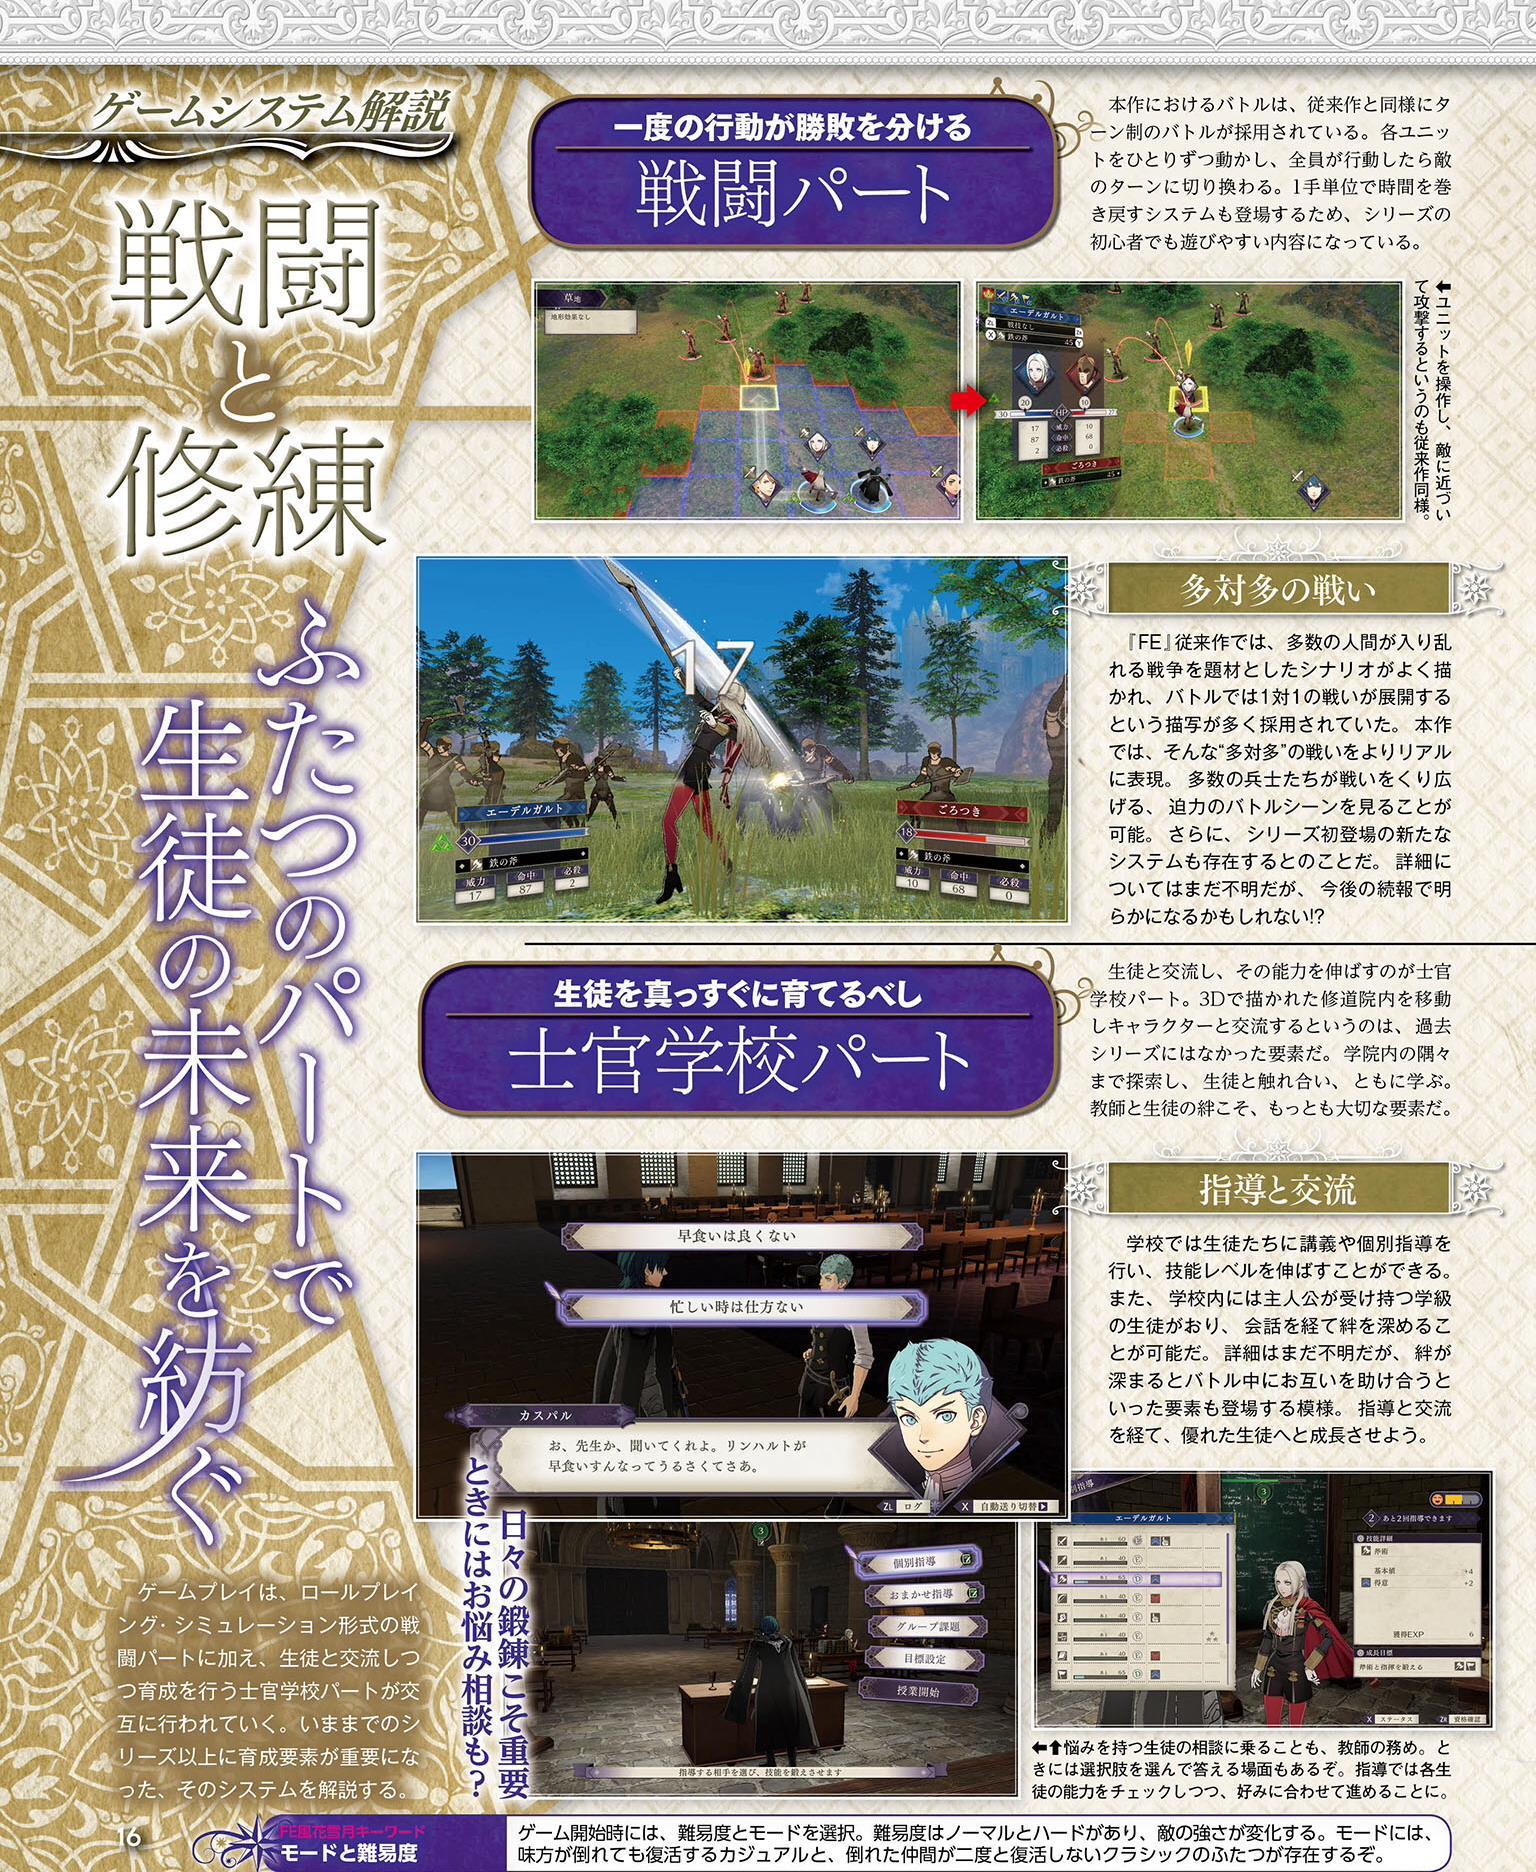 Fire Emblem: Three Houses - Famitsu Scan 5